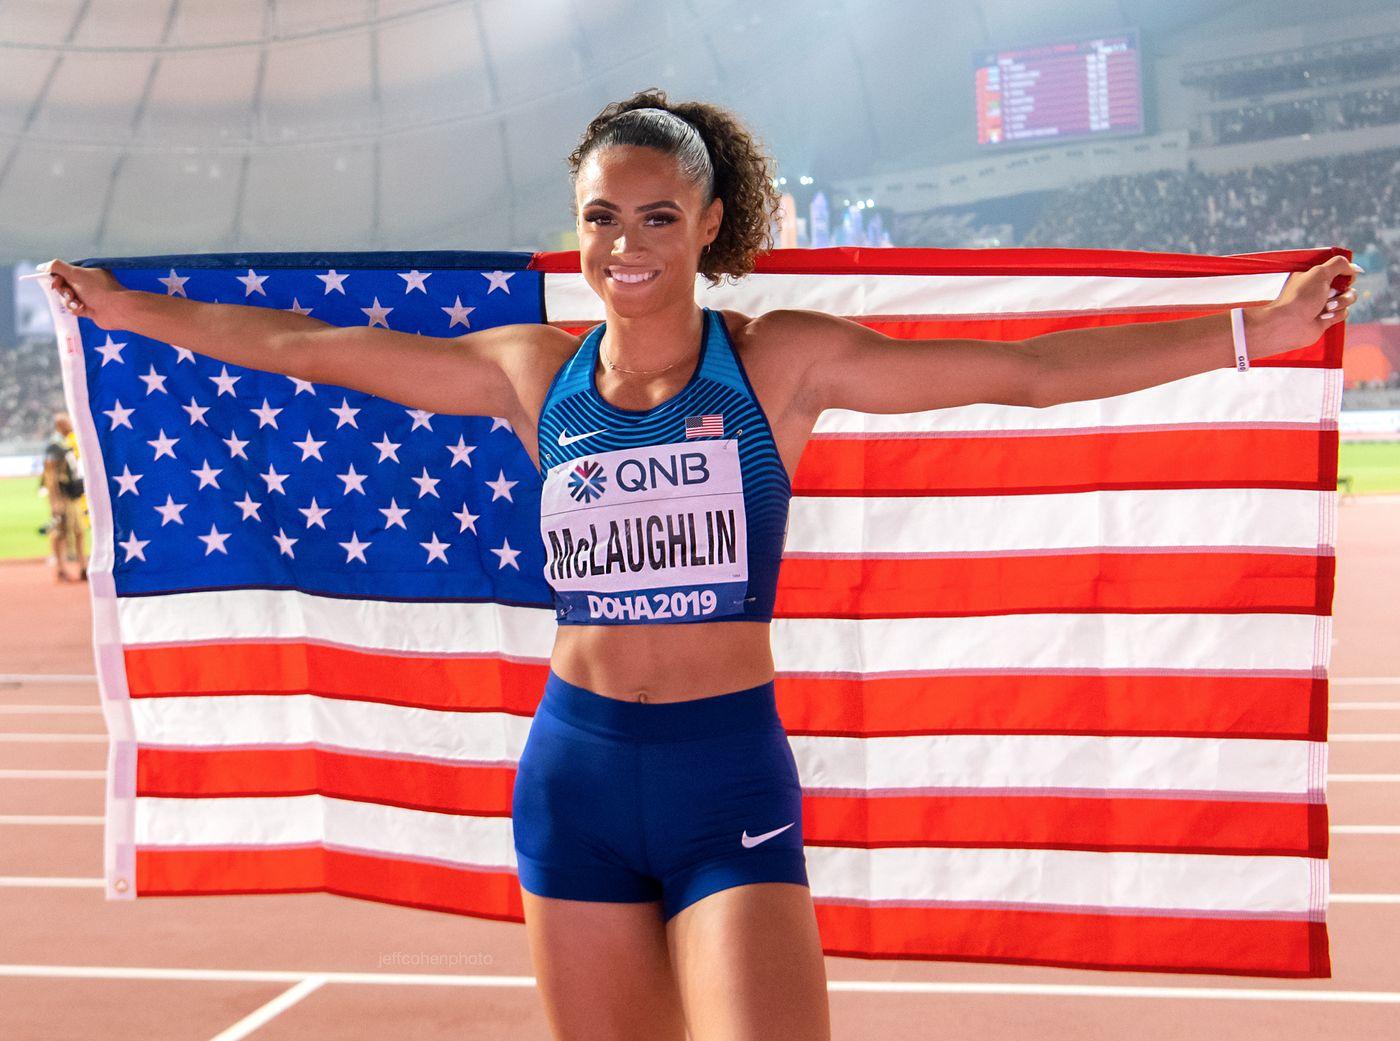 Sydney Mclaughlin, 400meter hurdles. 2019 IAAF WORLD ATHLETICS CHAMPIONSHIPS DOHA, QATAR